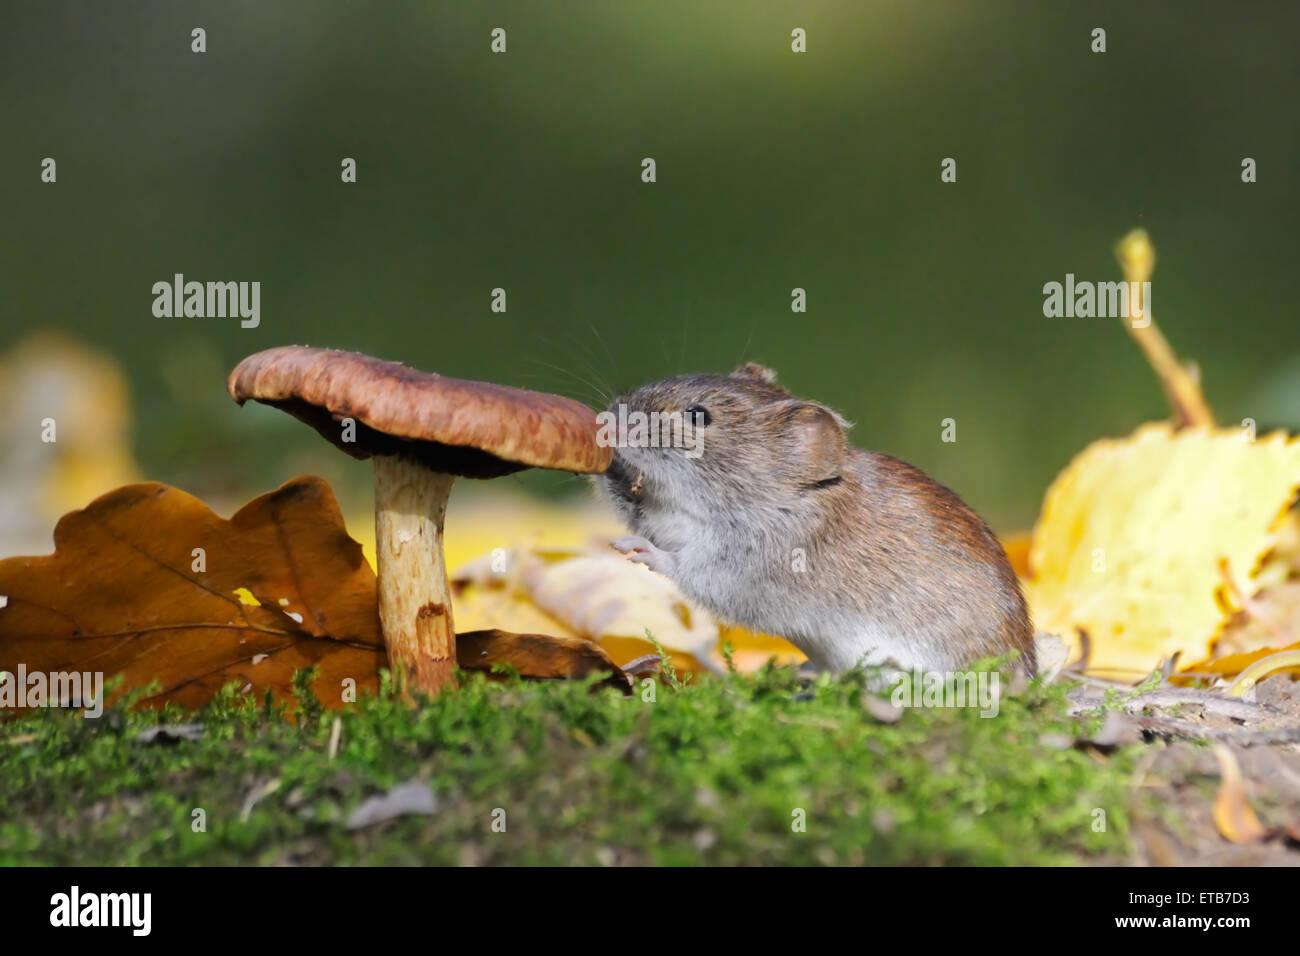 Wood mouse eats mushroom - Stock Image